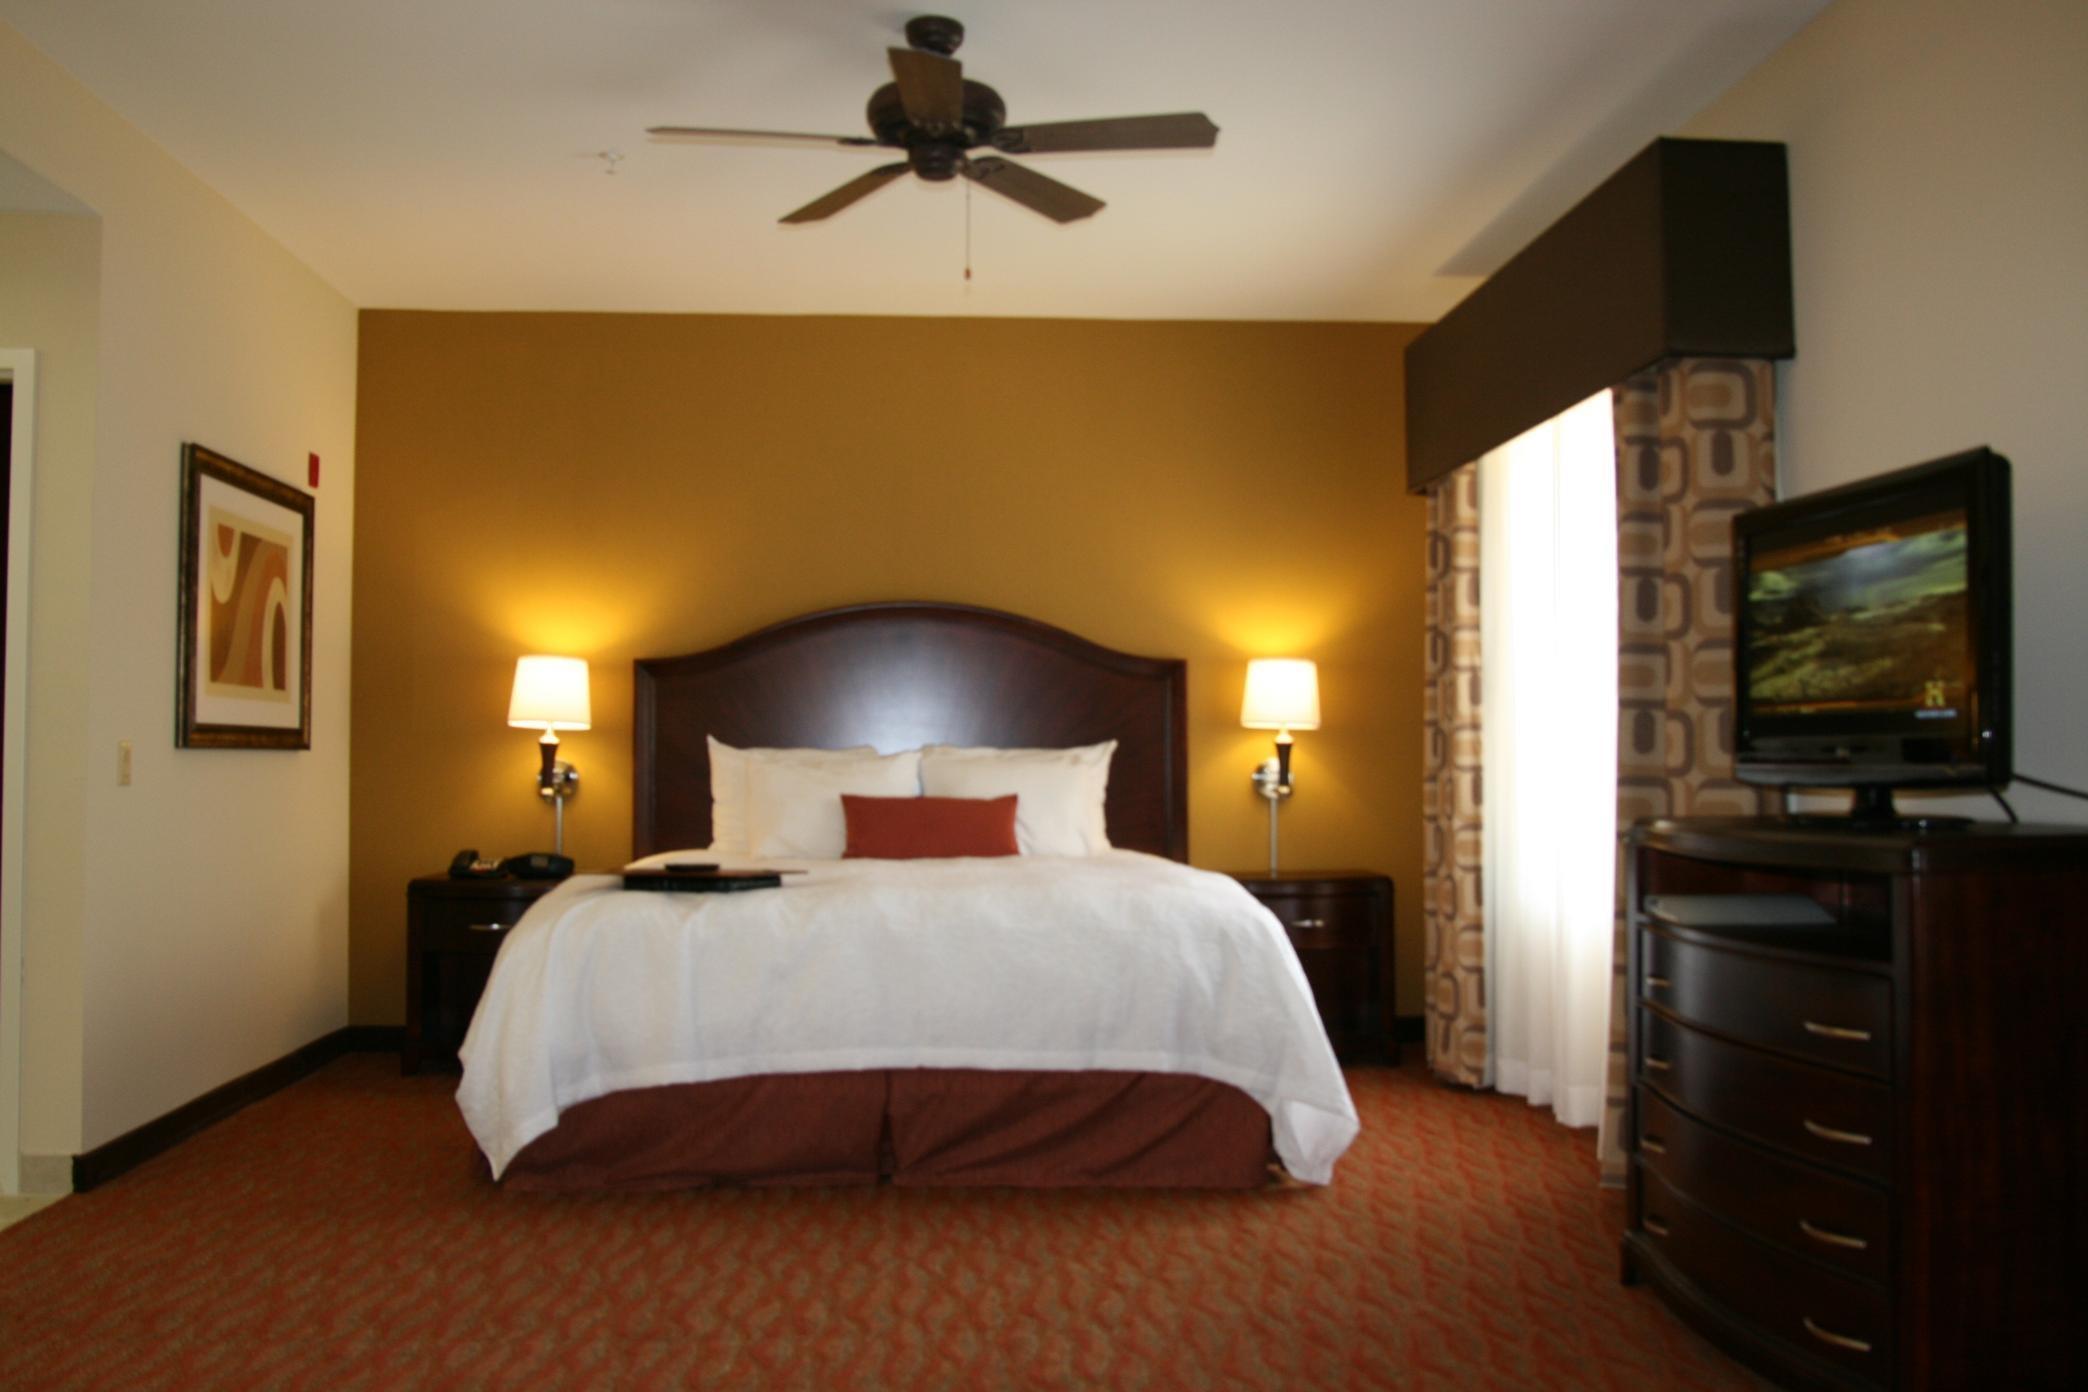 Hampton Inn & Suites Conroe - I-45 North image 10